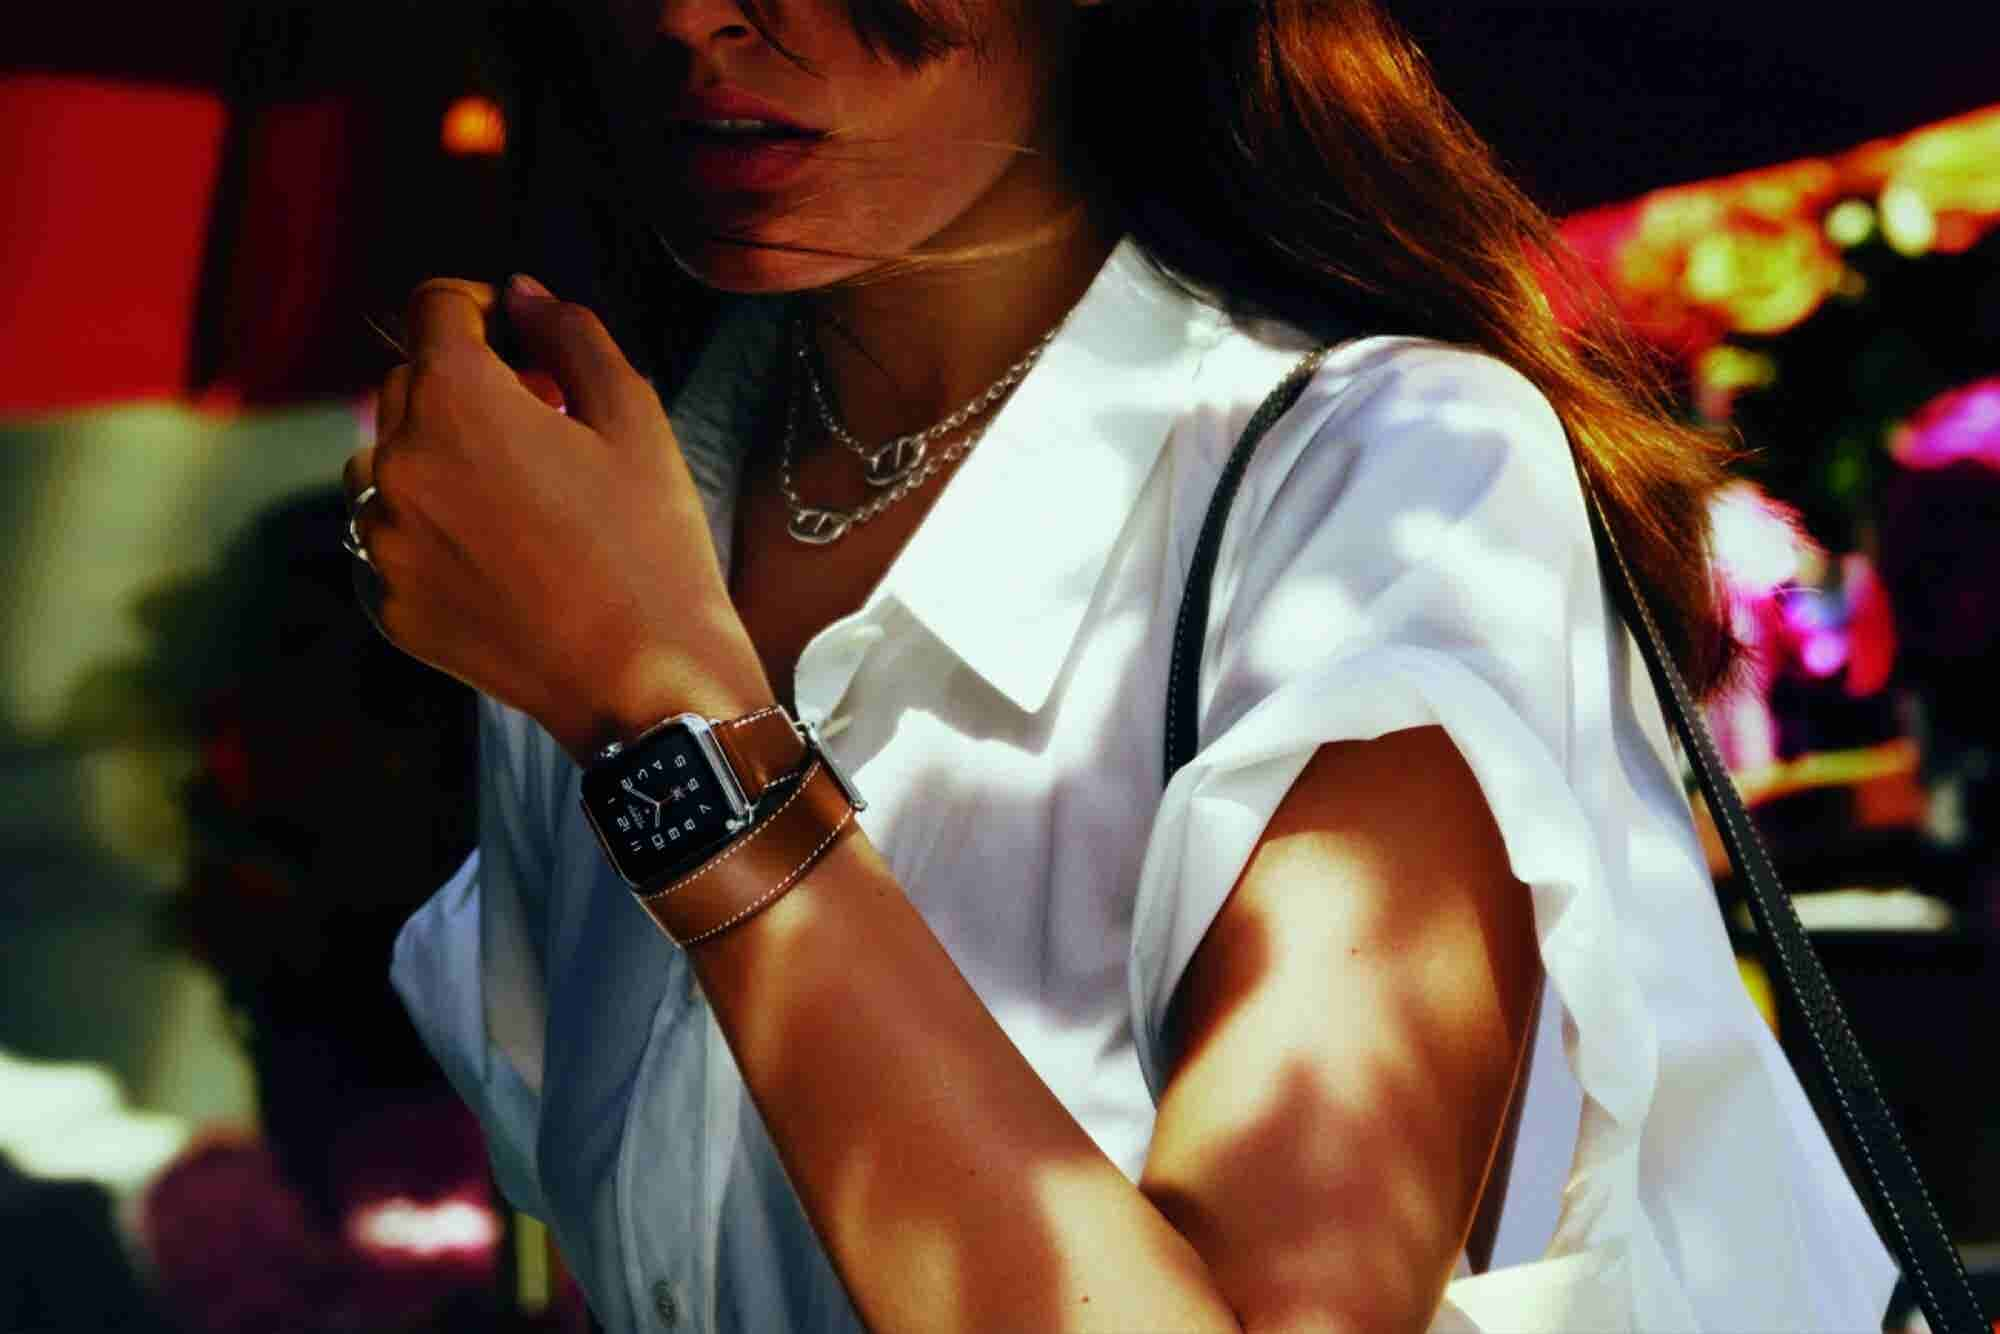 Transcending Time: Apple Watch Hermès